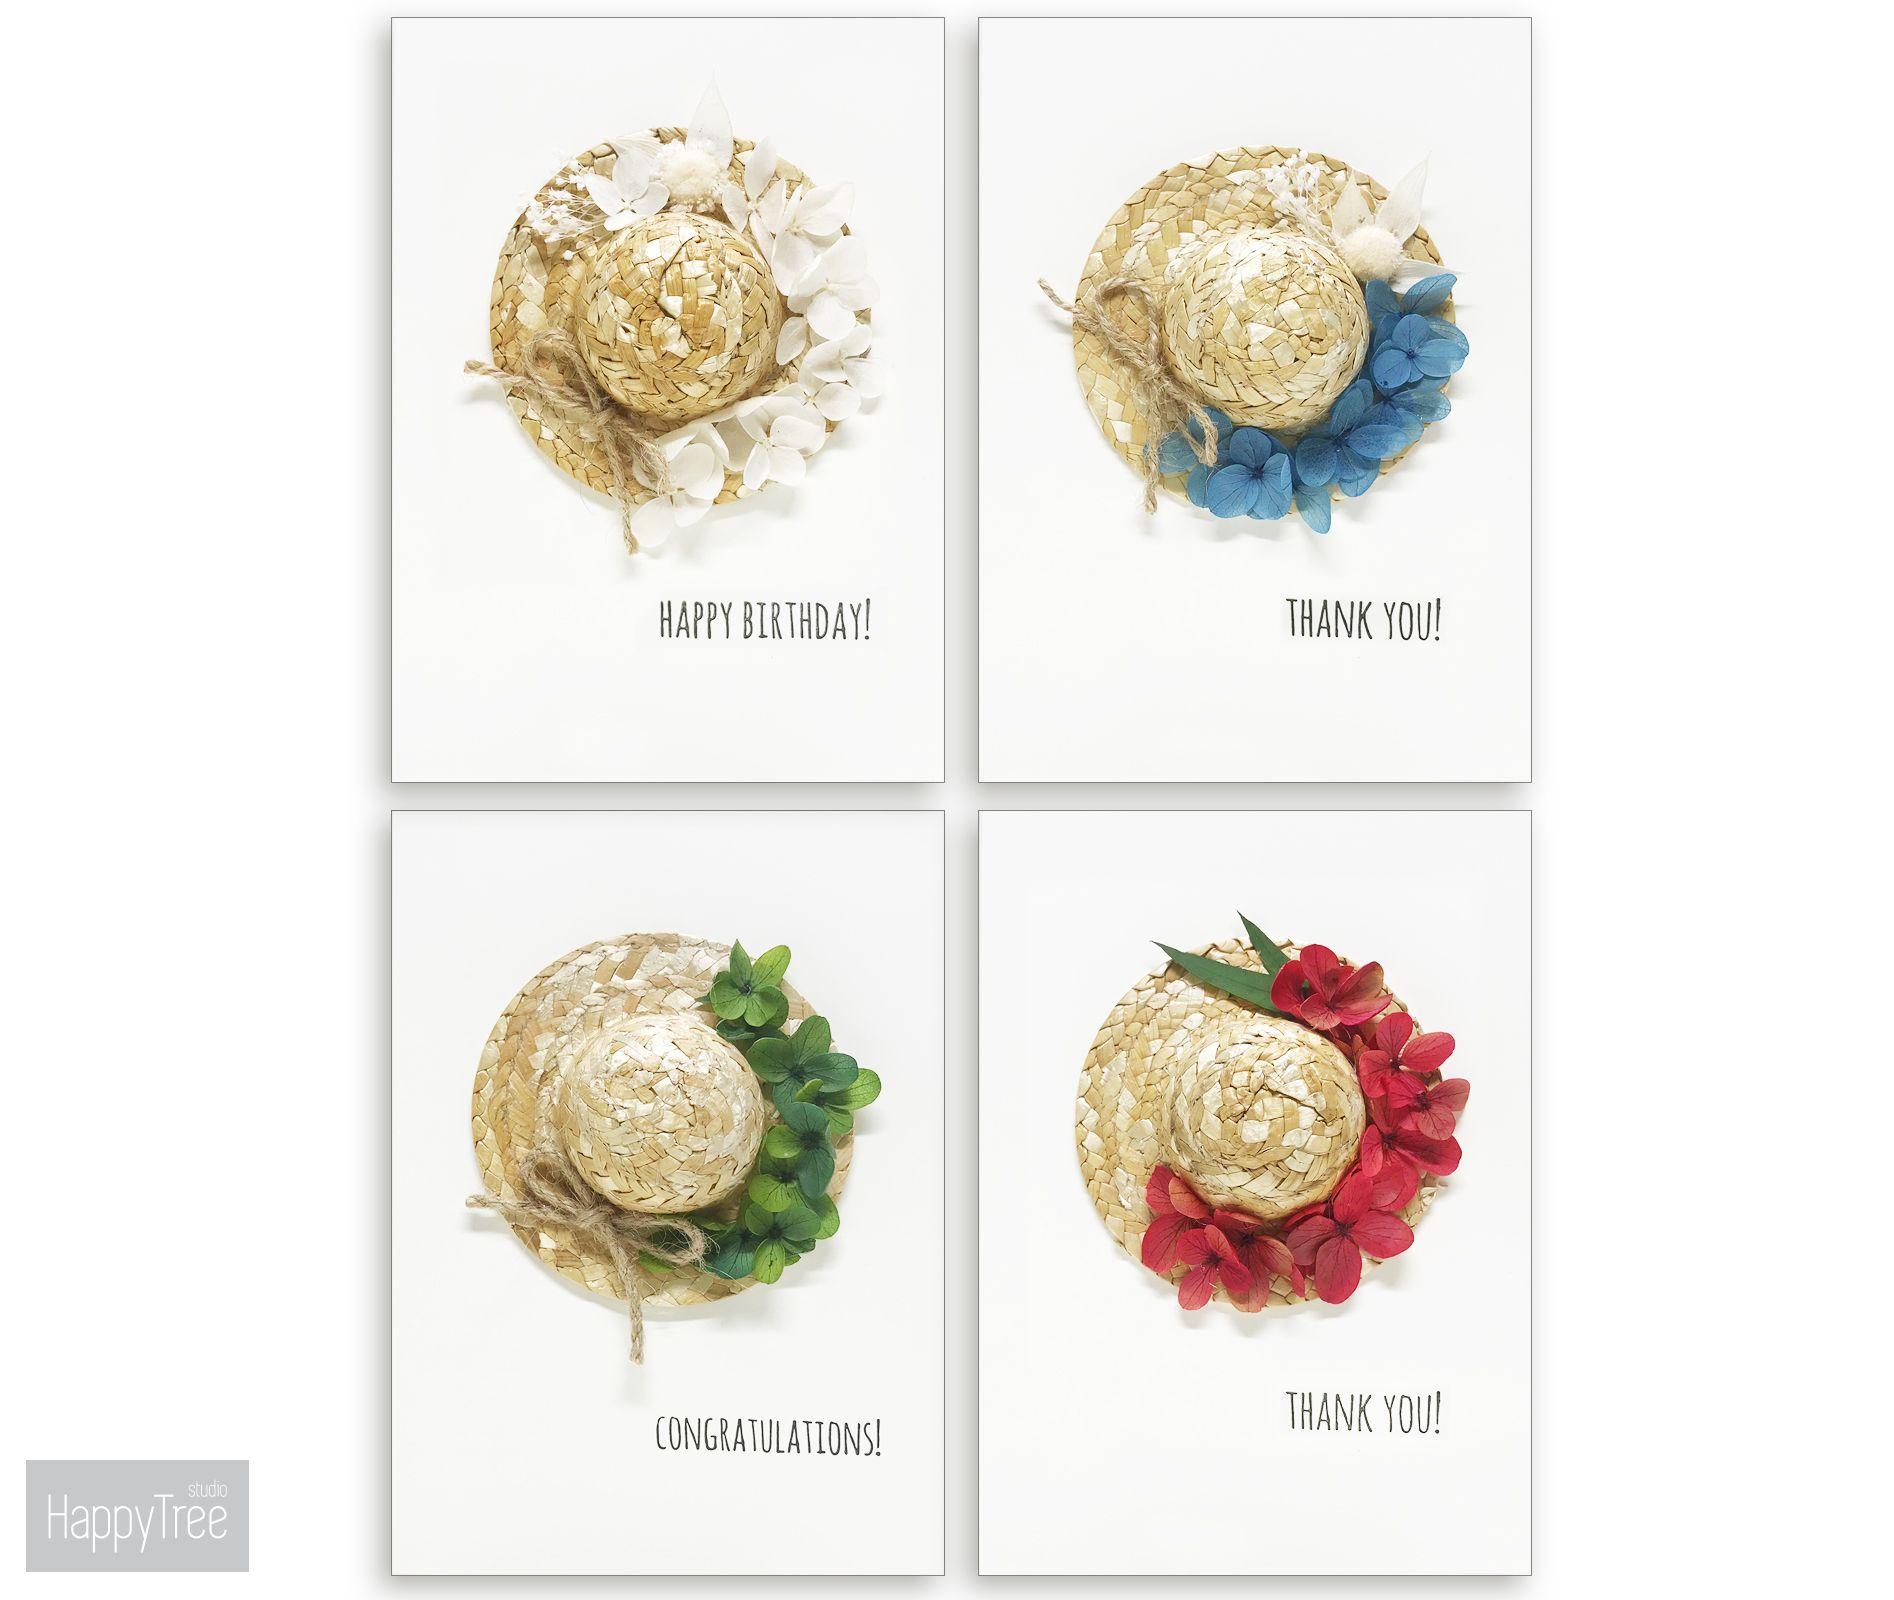 D floral greeting cards custom stamp handmade cards birthday card